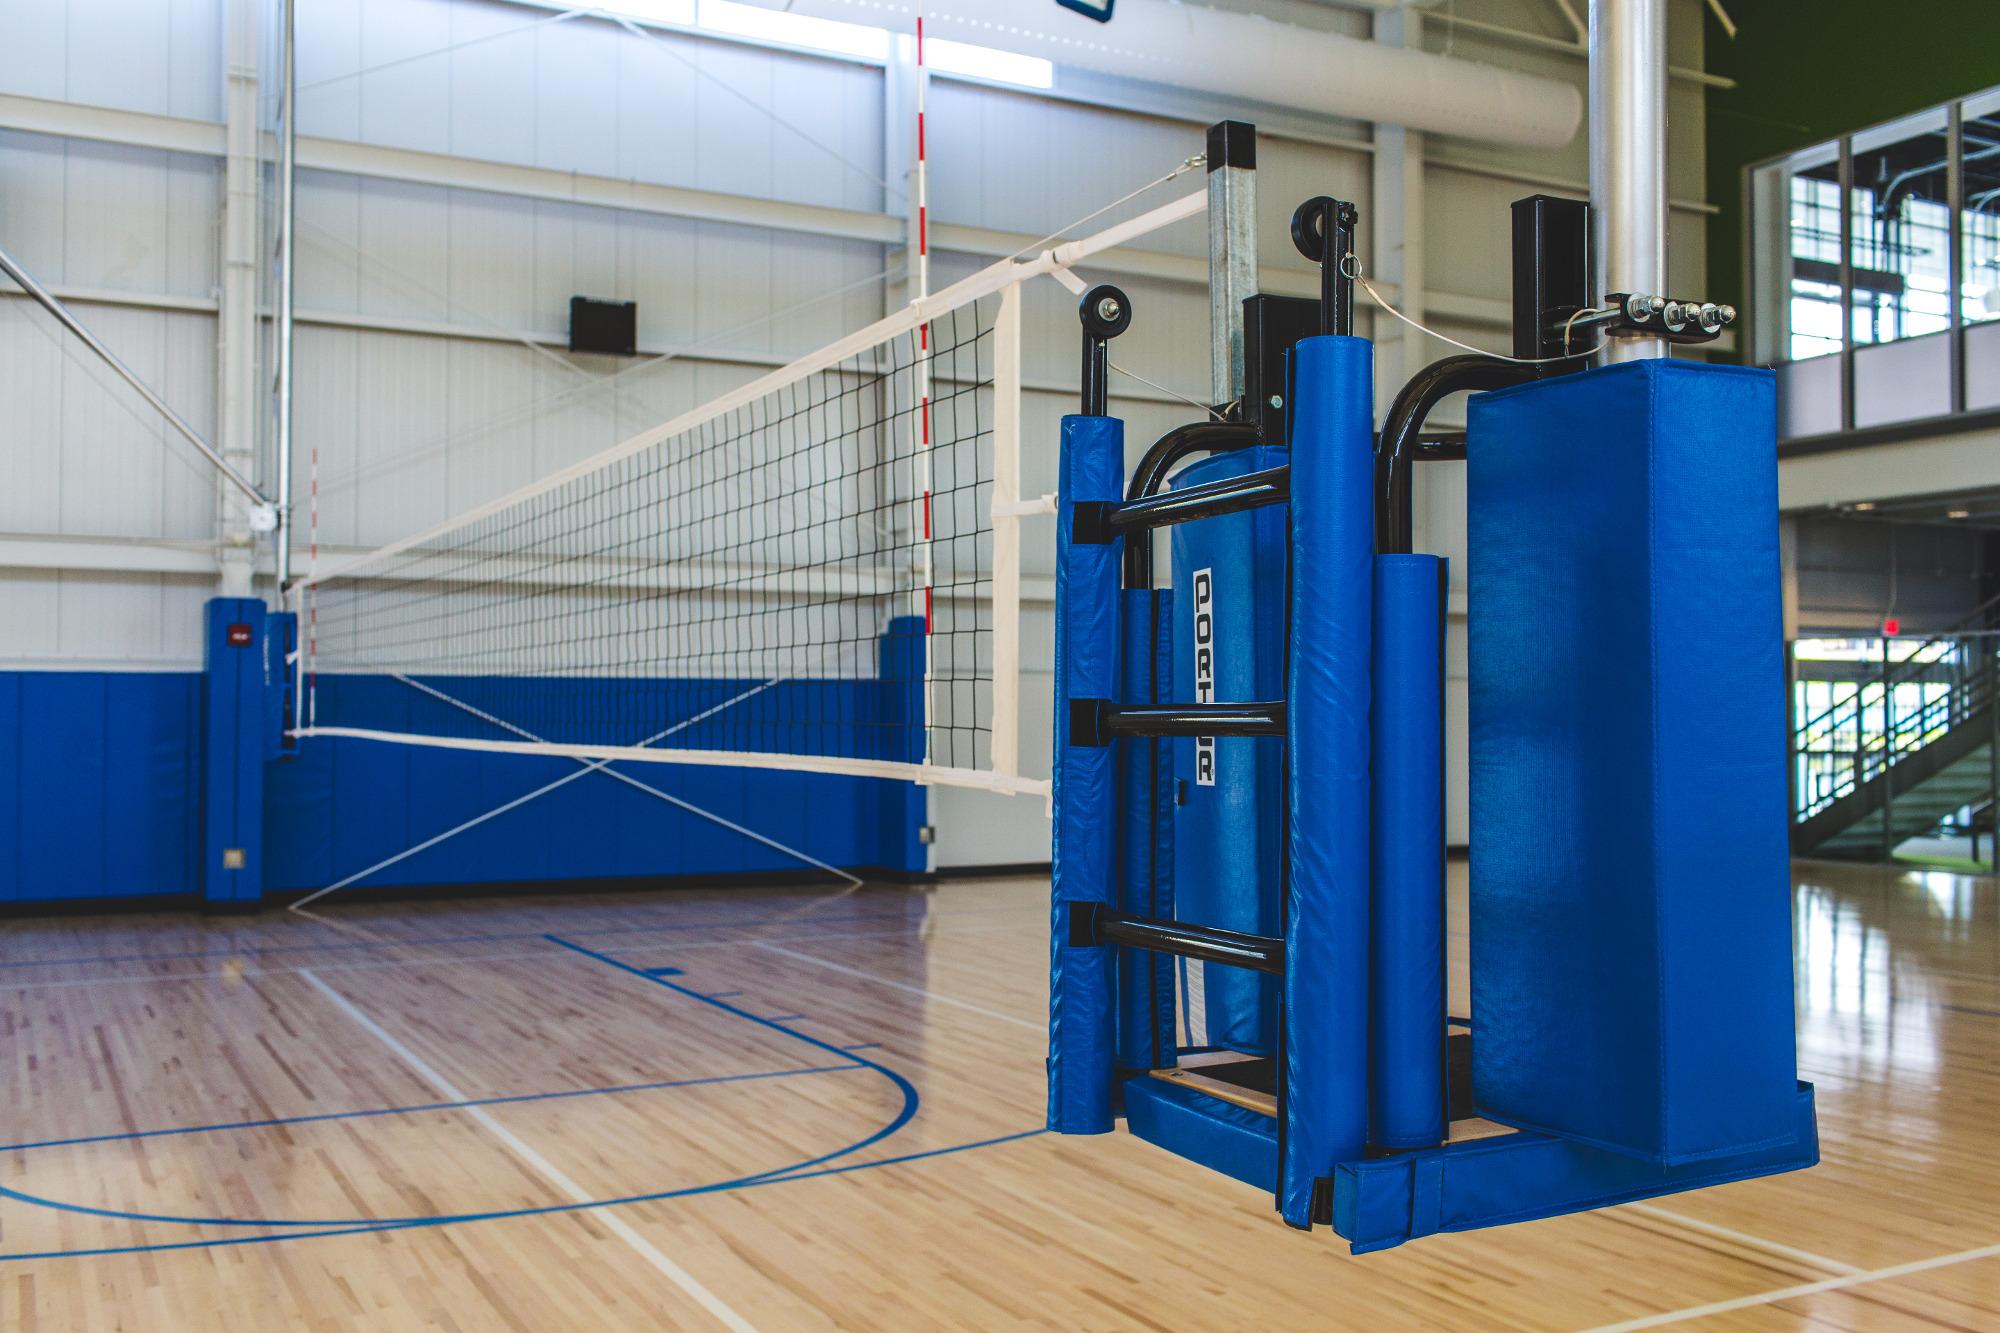 SportsFactory-18.jpg